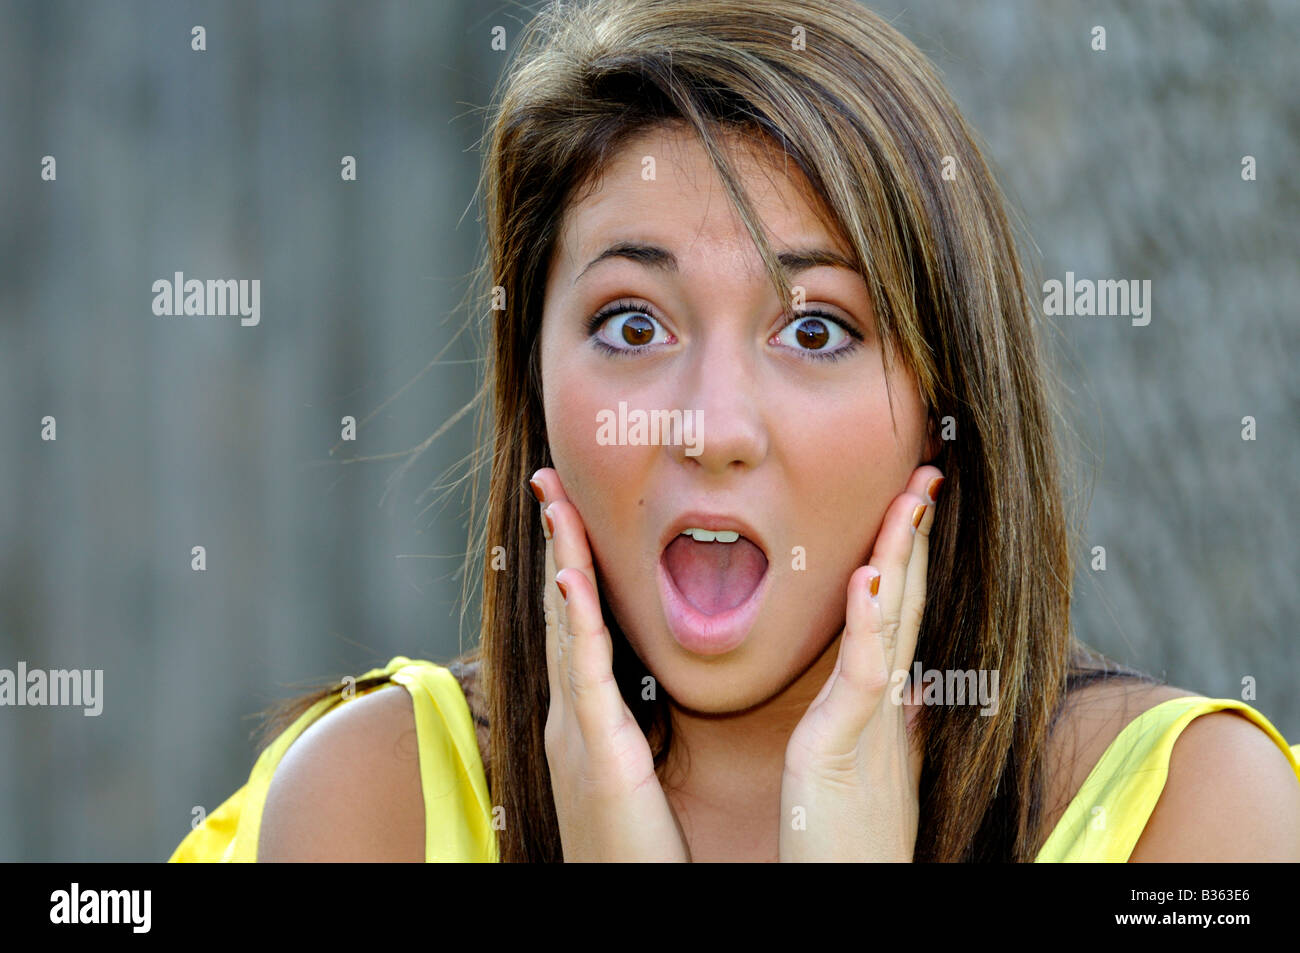 Female facial expression surprise